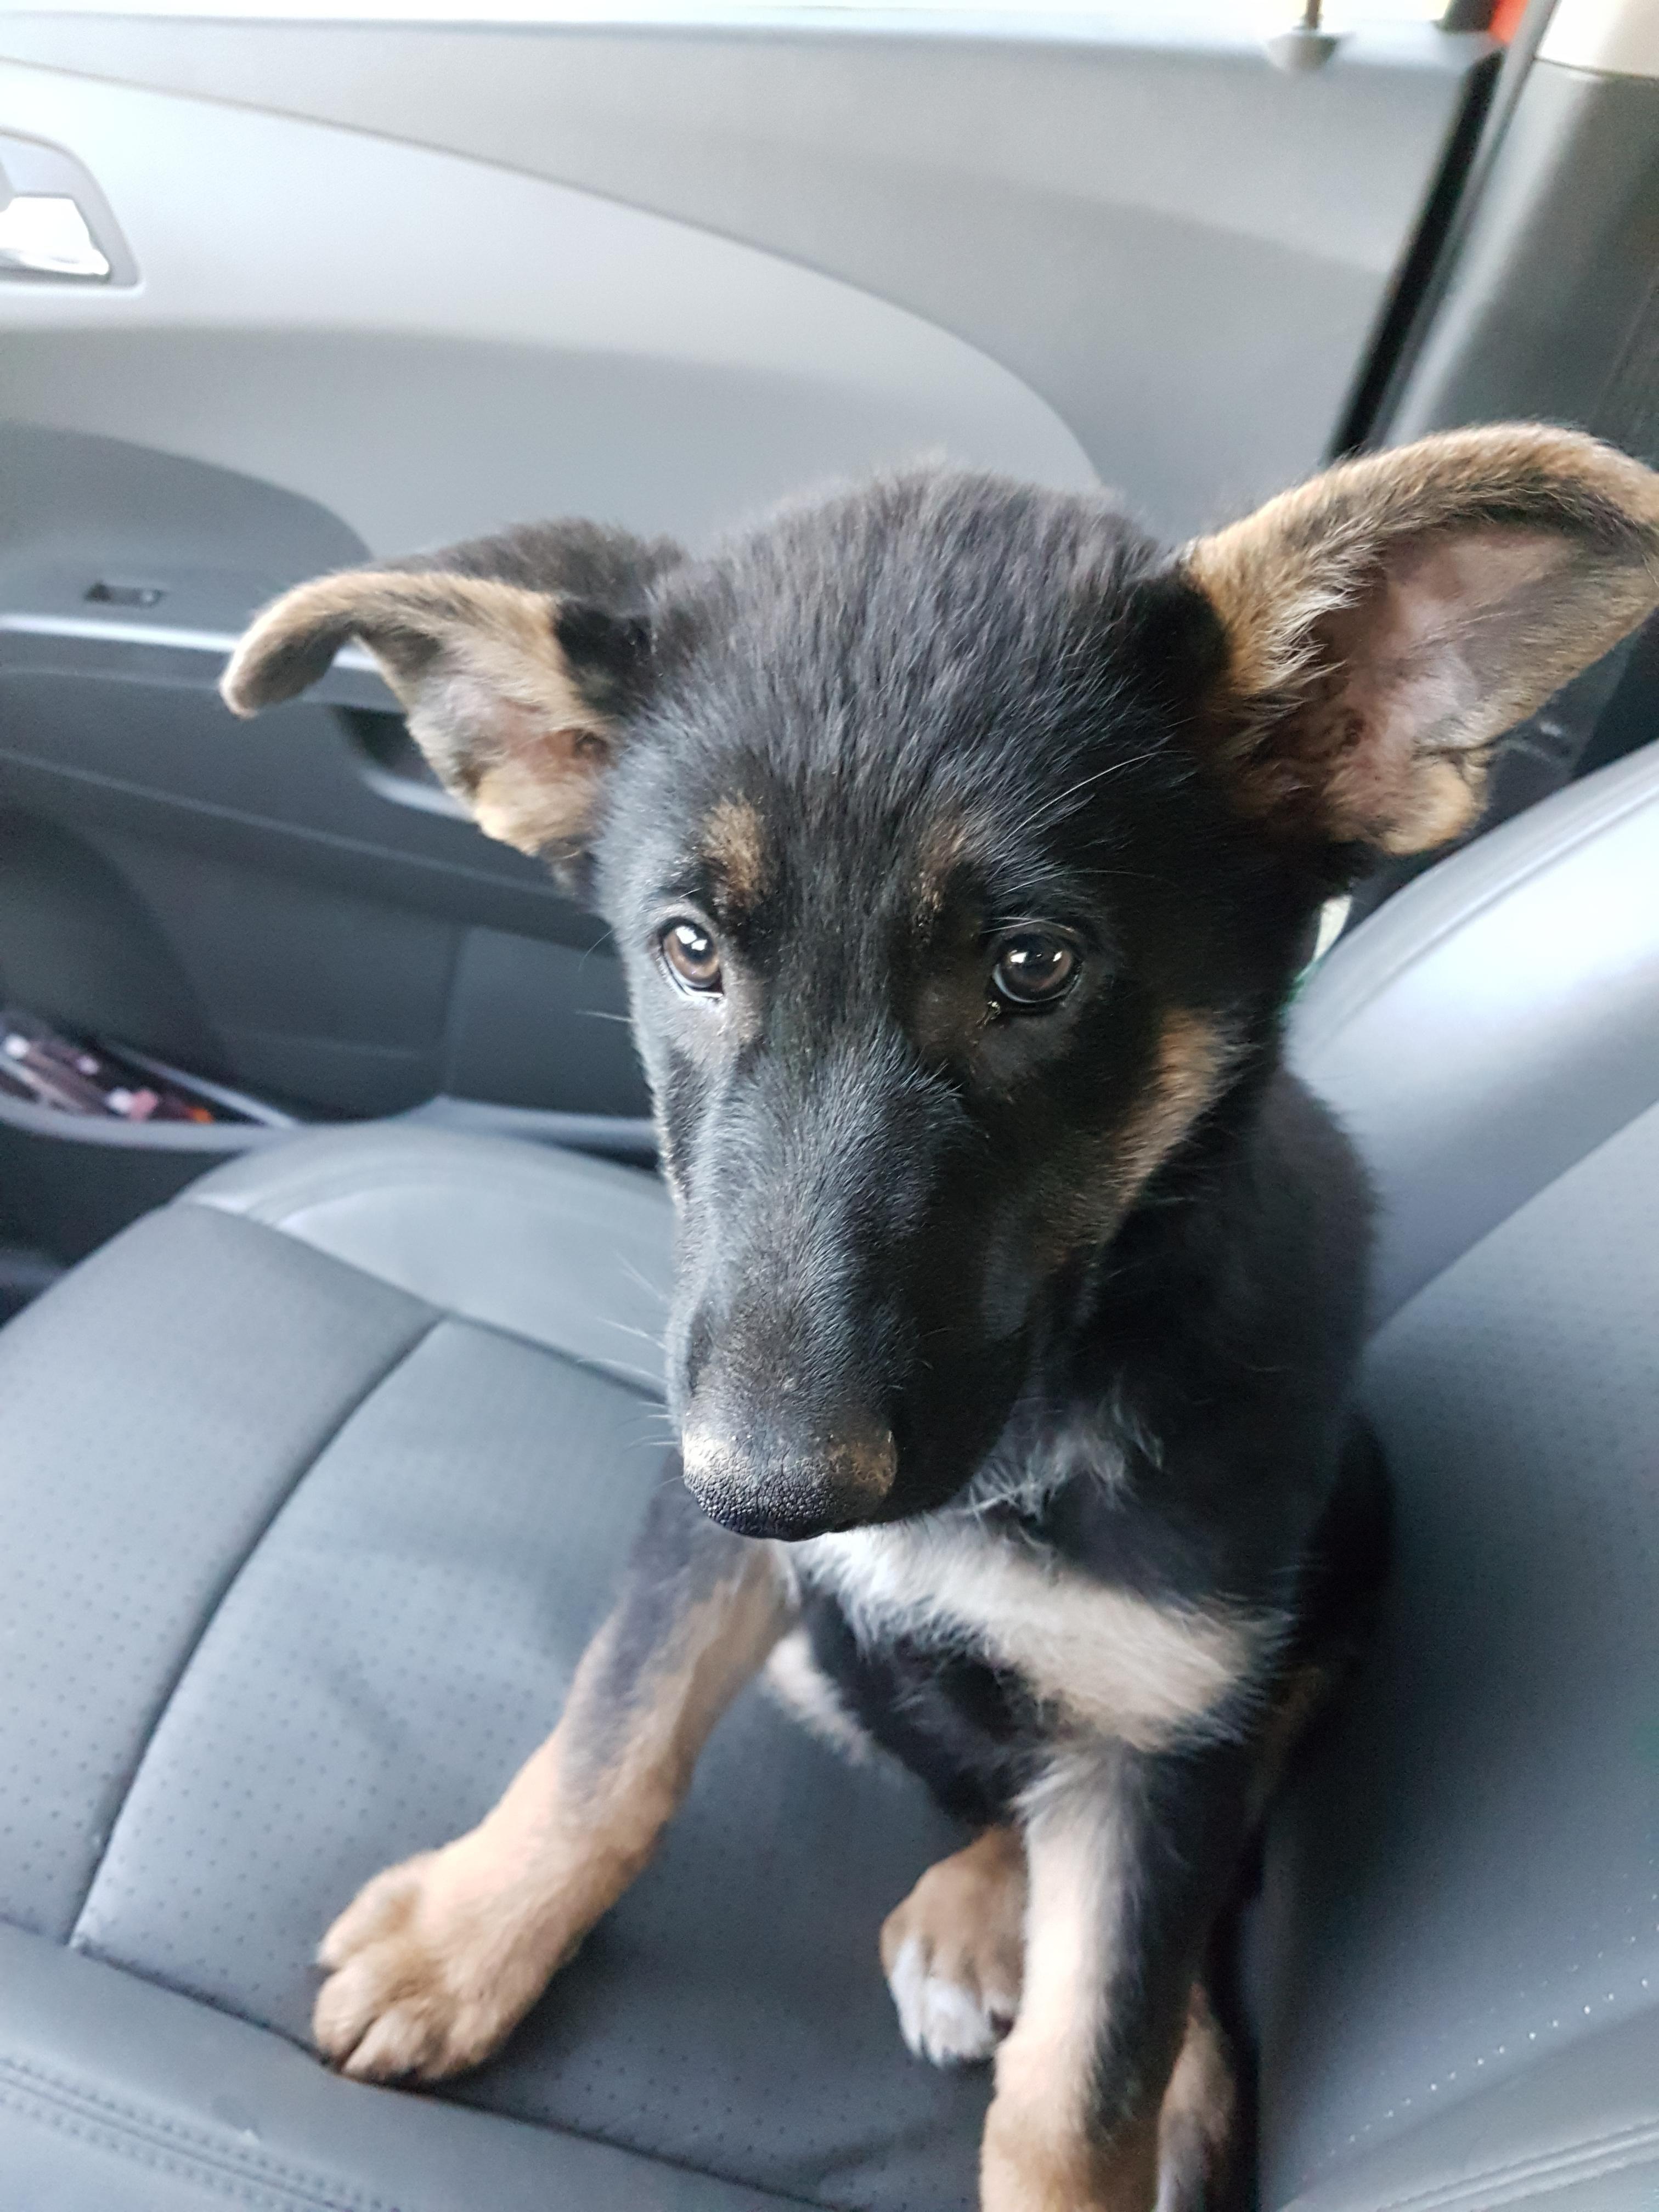 Brought Home This Terrifying German Shepherd Yesterday Reddit Say